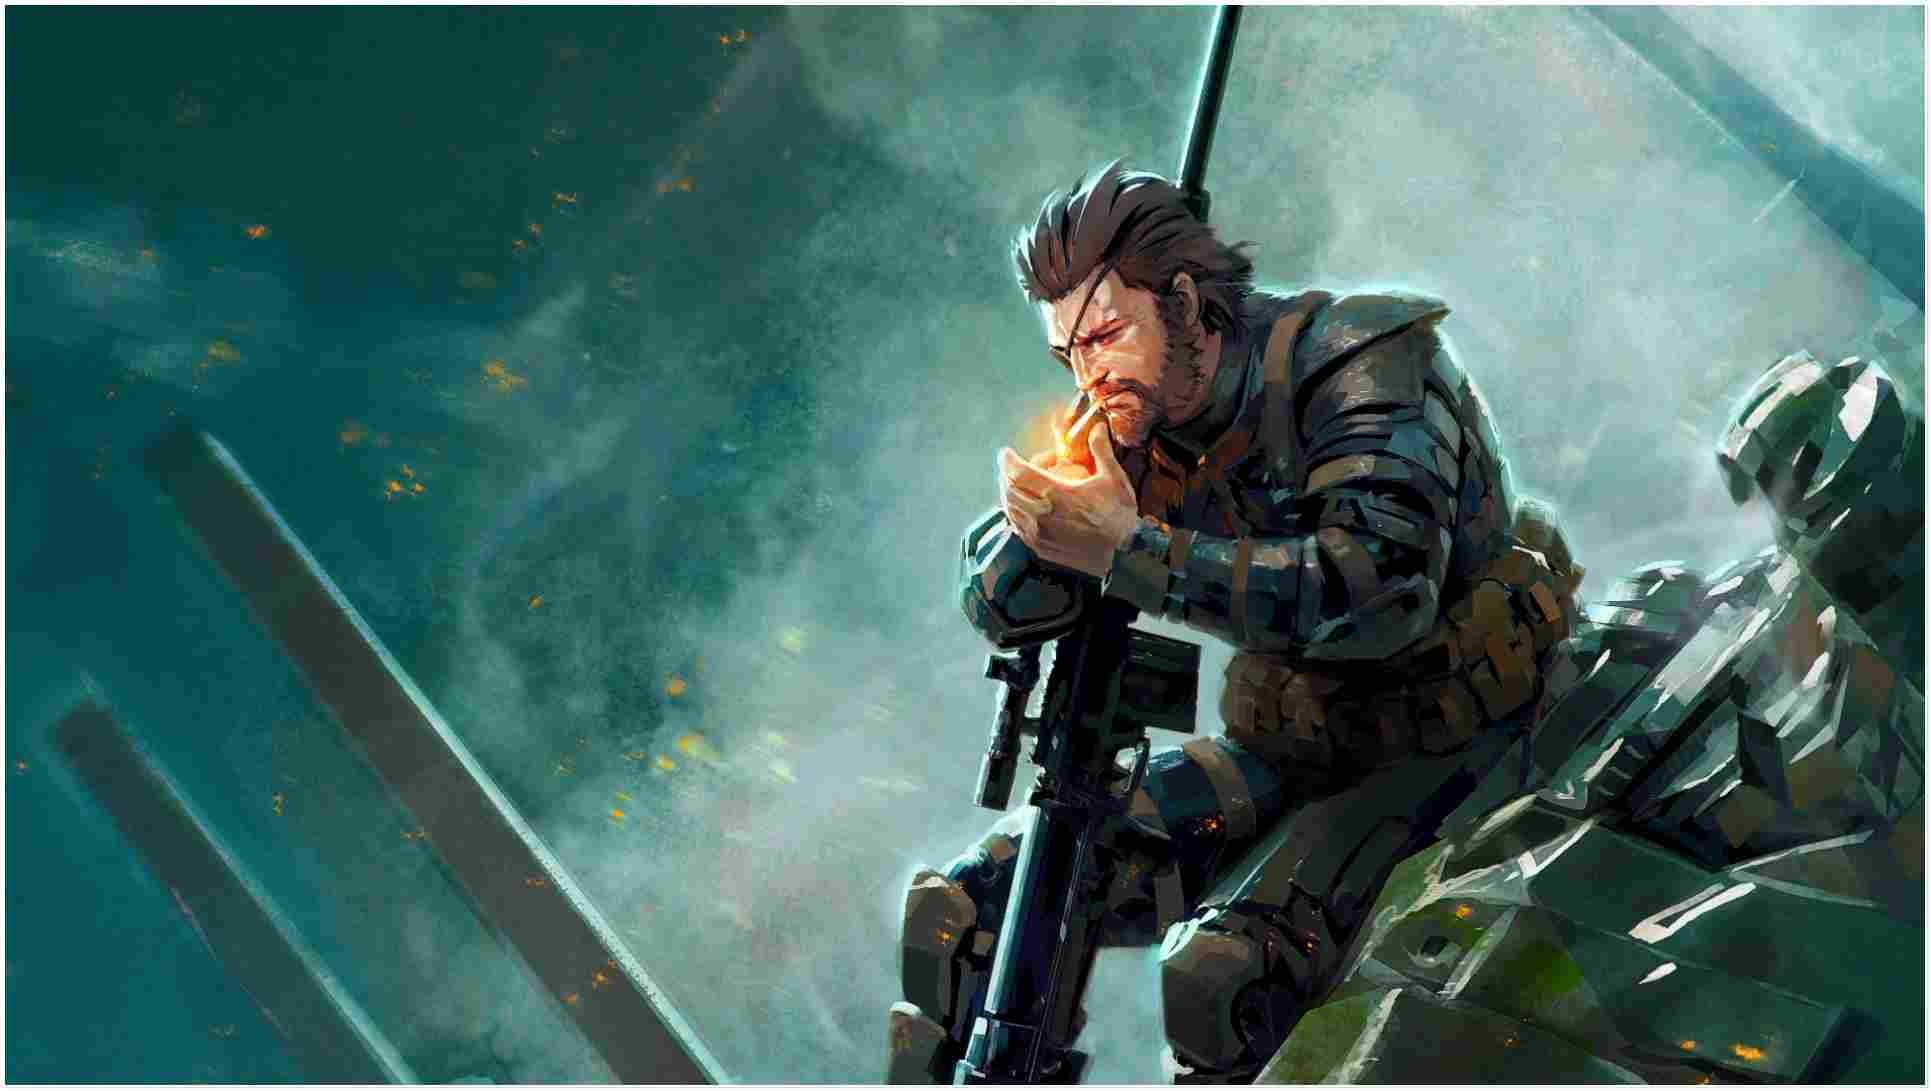 Best Of 16 Metal Gear Solid Wallpapers Metal Gear Solid Metal Gear Metal Gear Solid Quiet